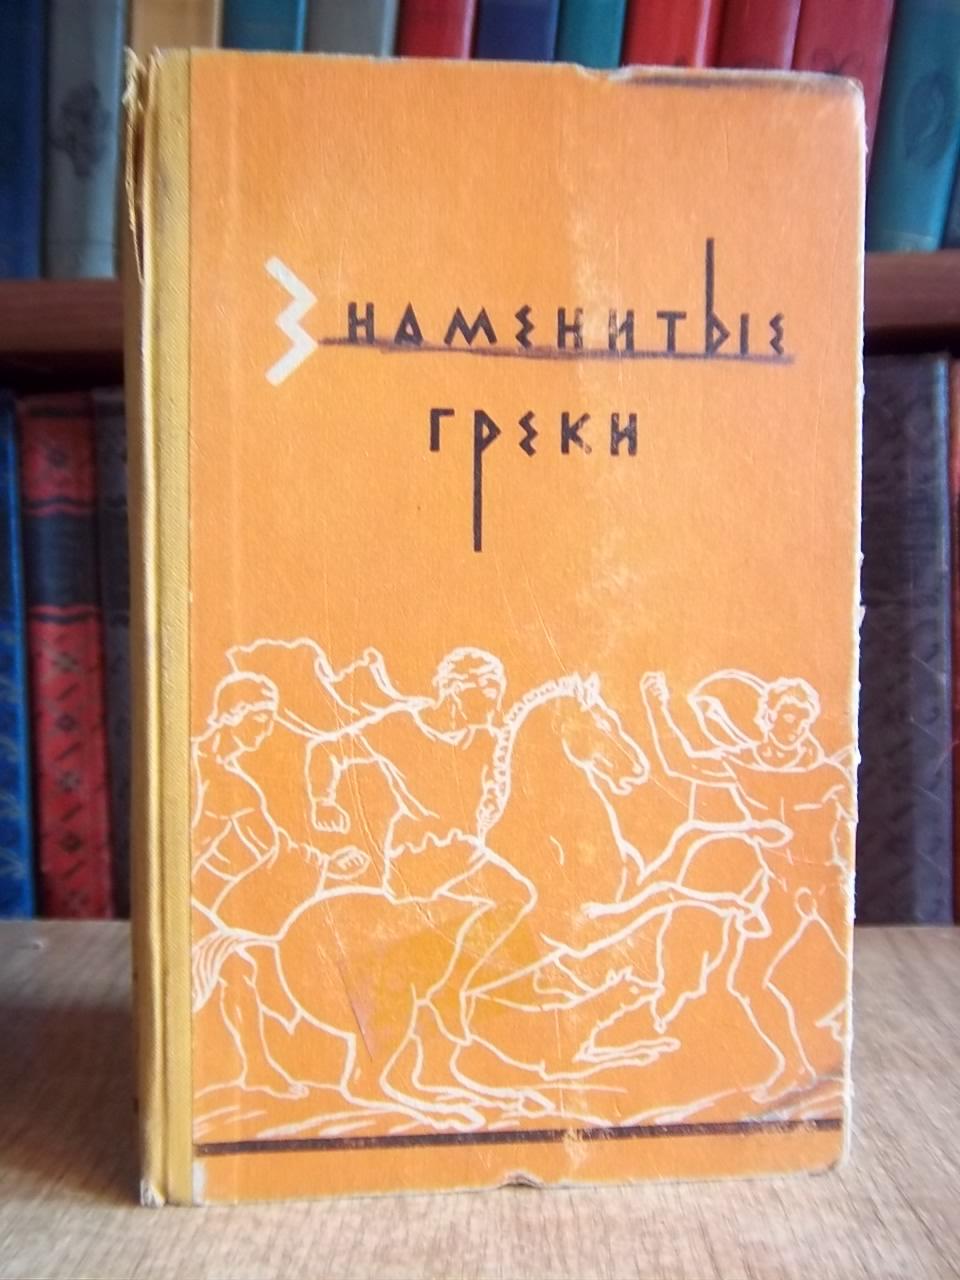 Знаменитые греки Жизнеописание Плутарха